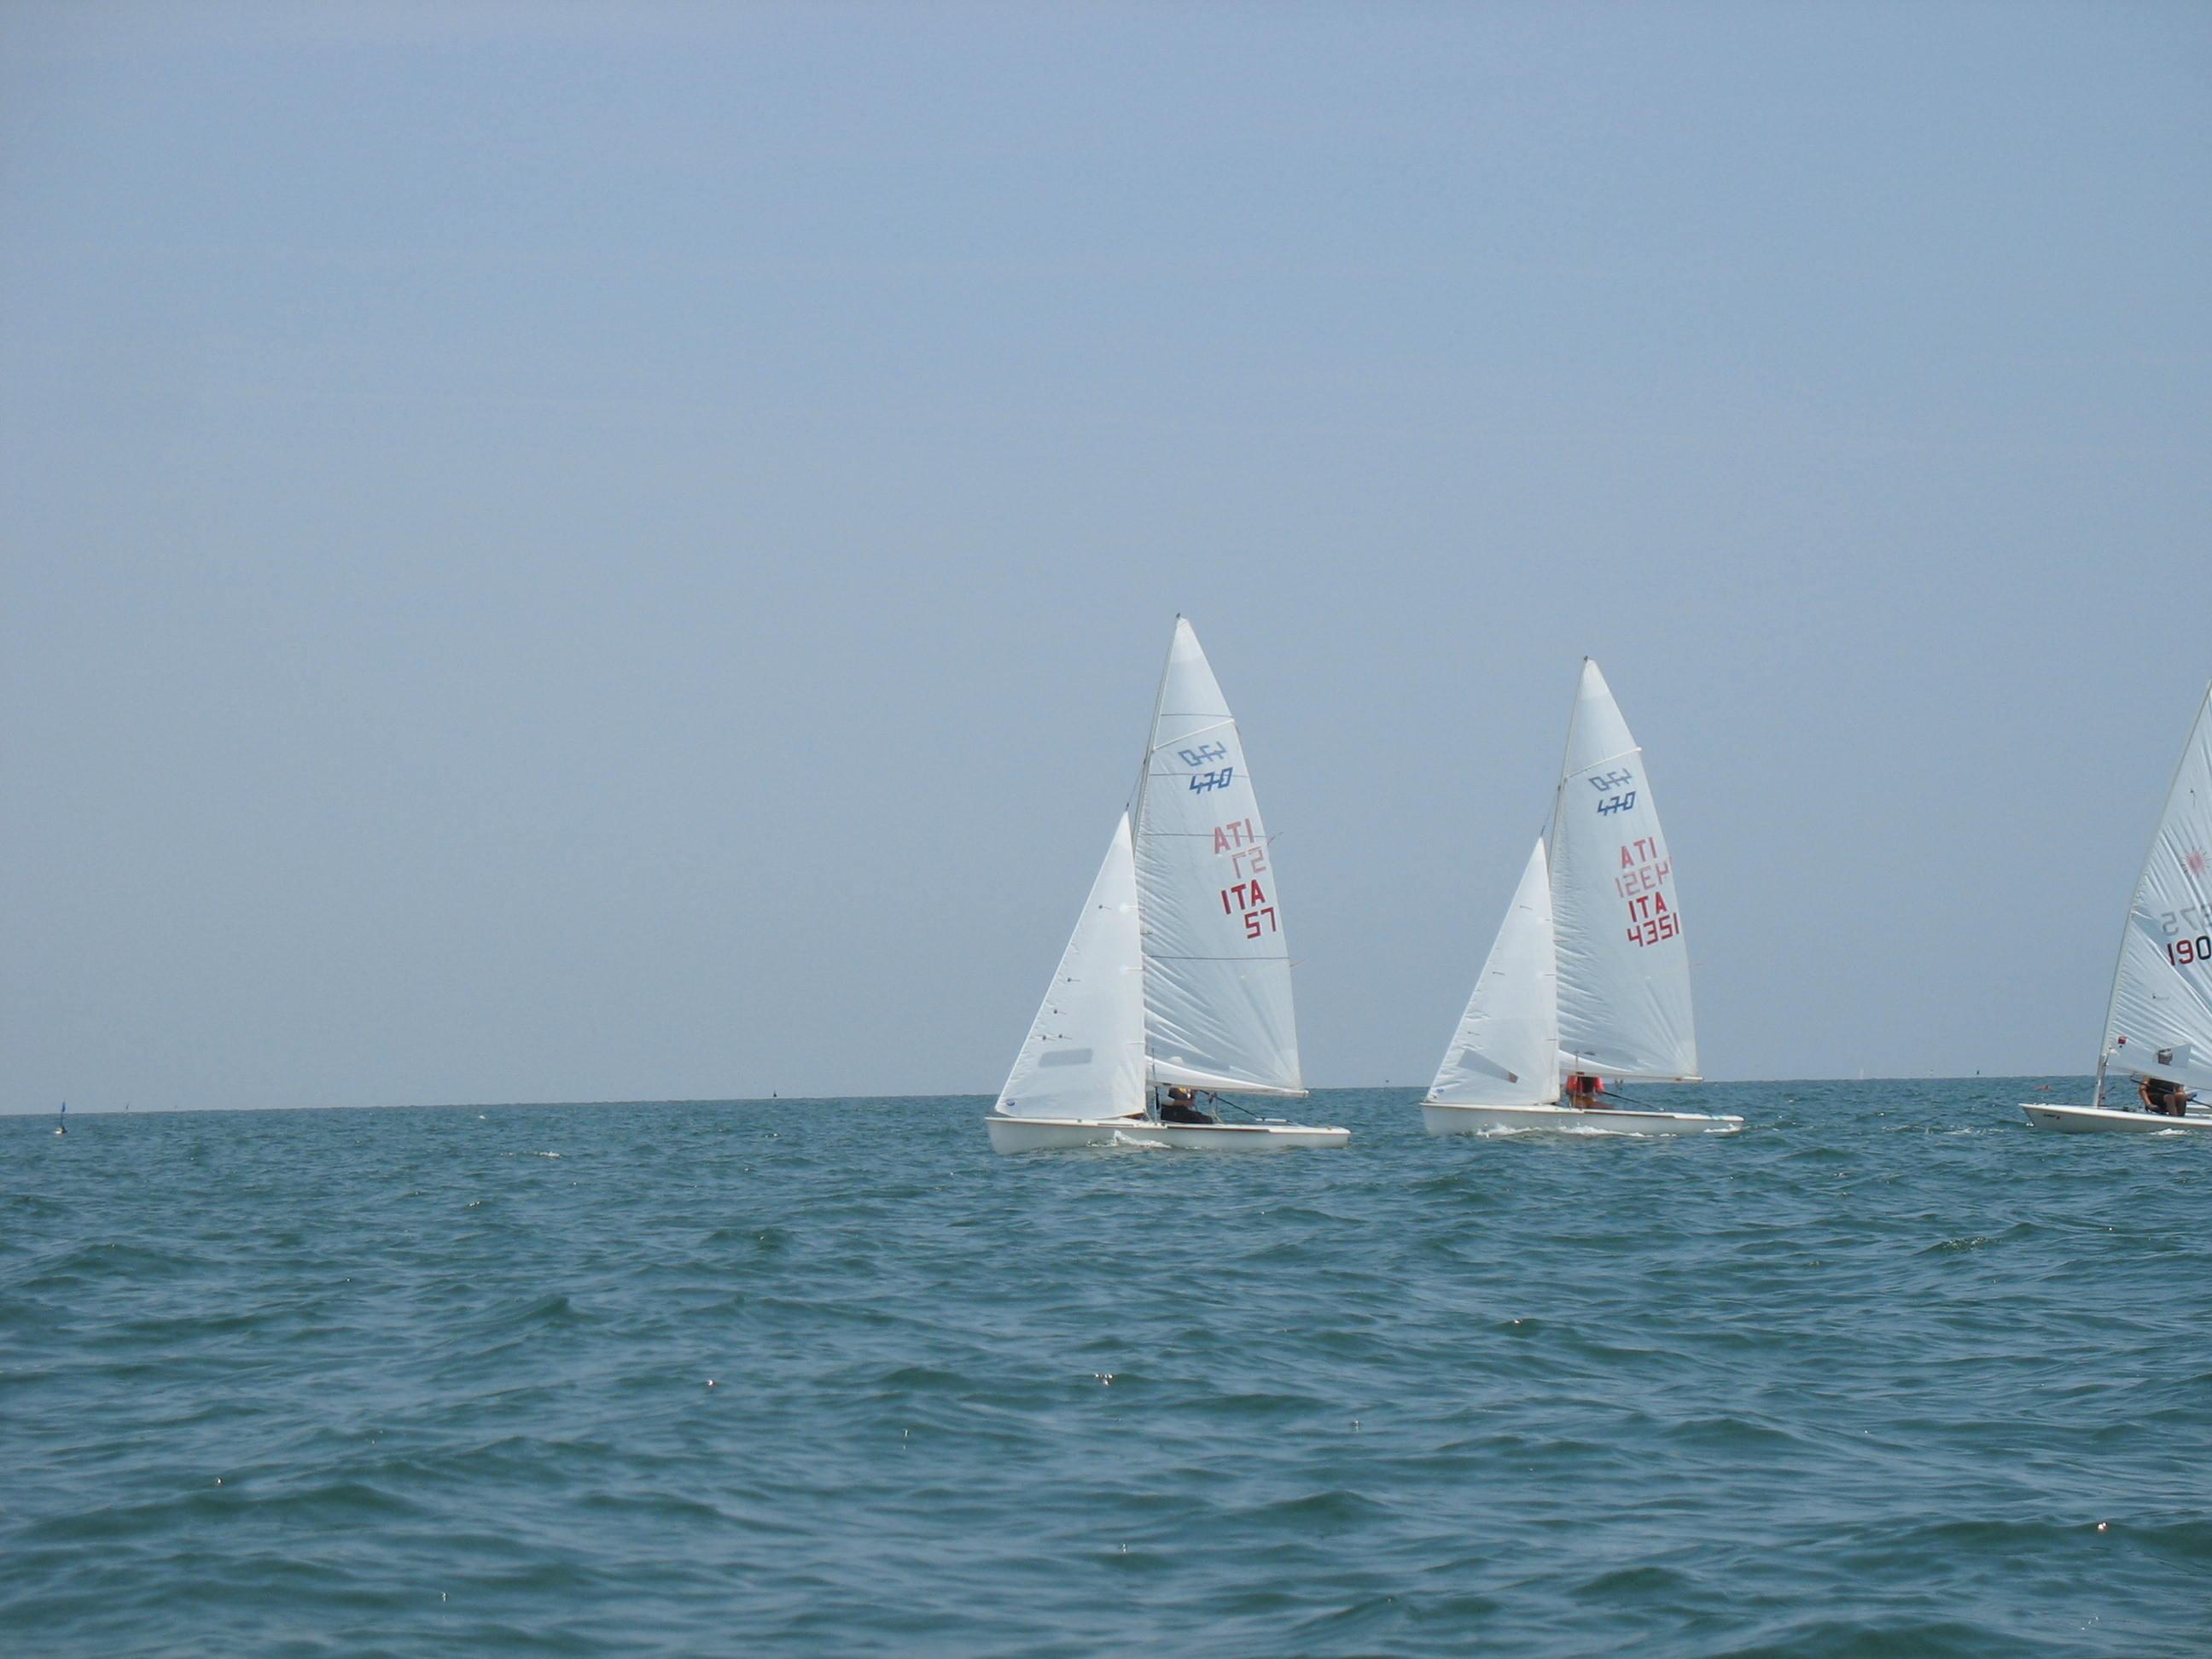 5-torneo-elia-tonelli-27062010-011